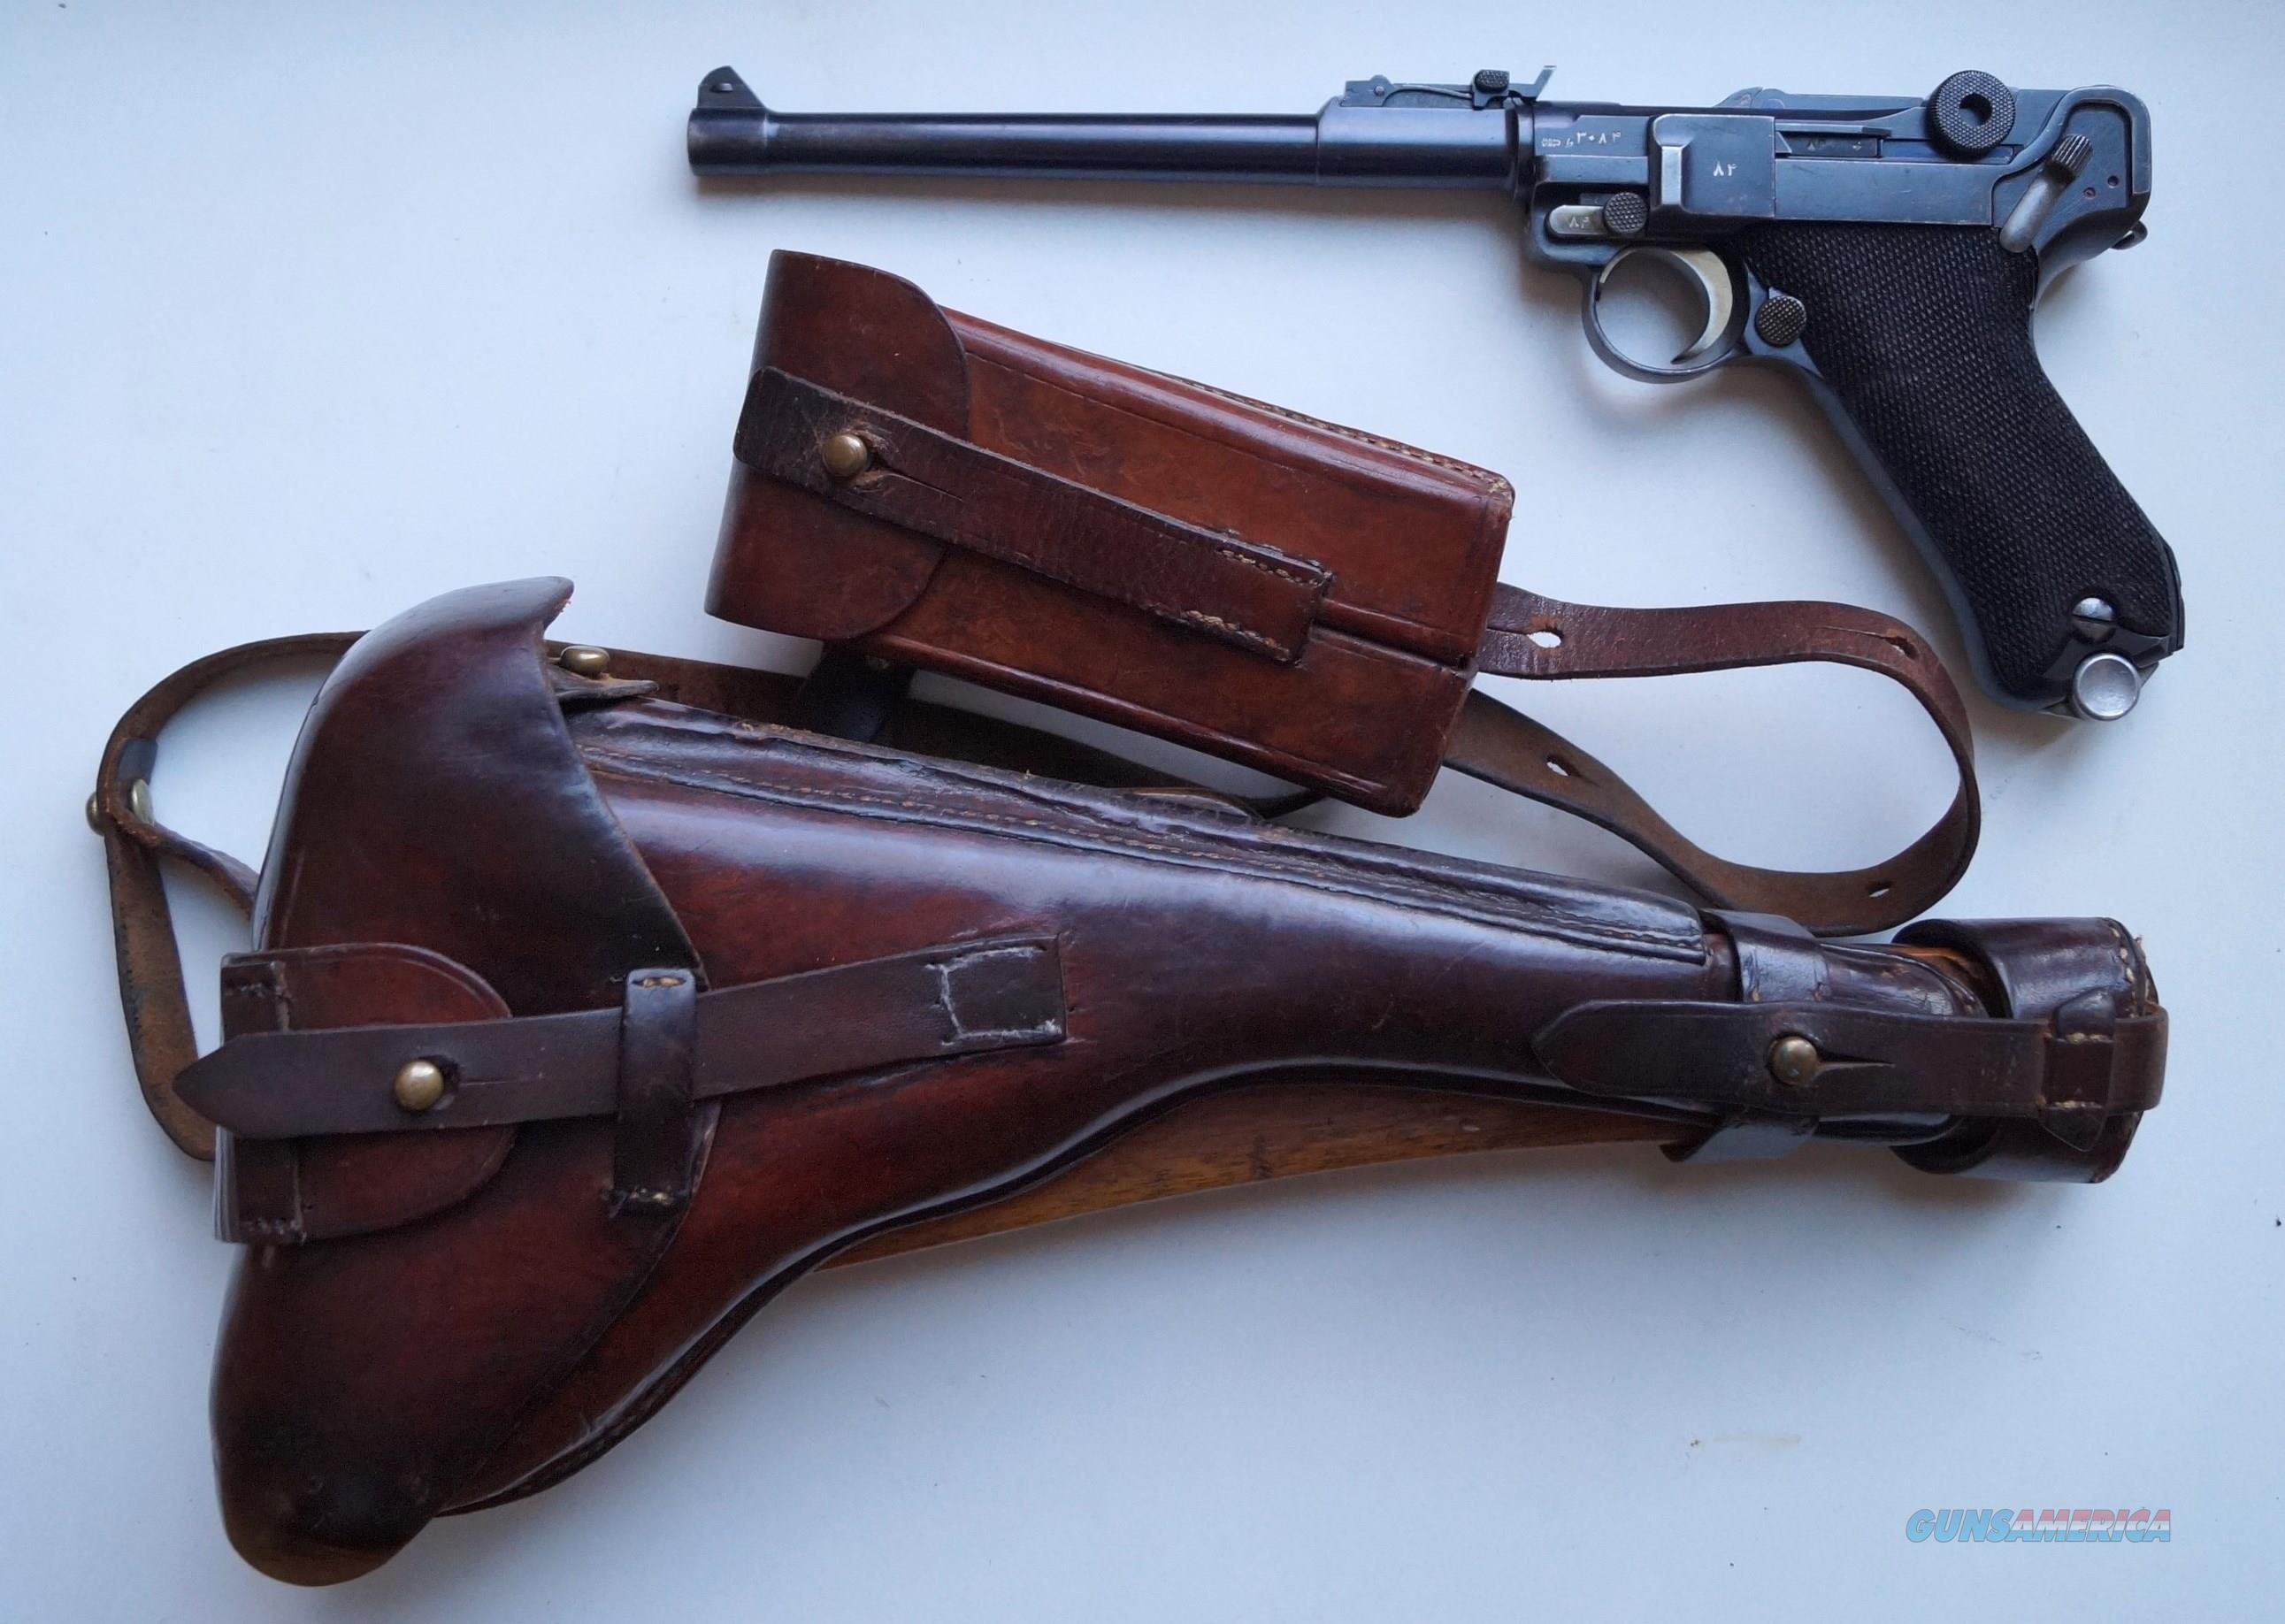 MAUSER PERSIAN (IRANIAN) ARTILLERY GERMAN LUGER RIG (VERY RARE)  Guns > Pistols > Luger Pistols